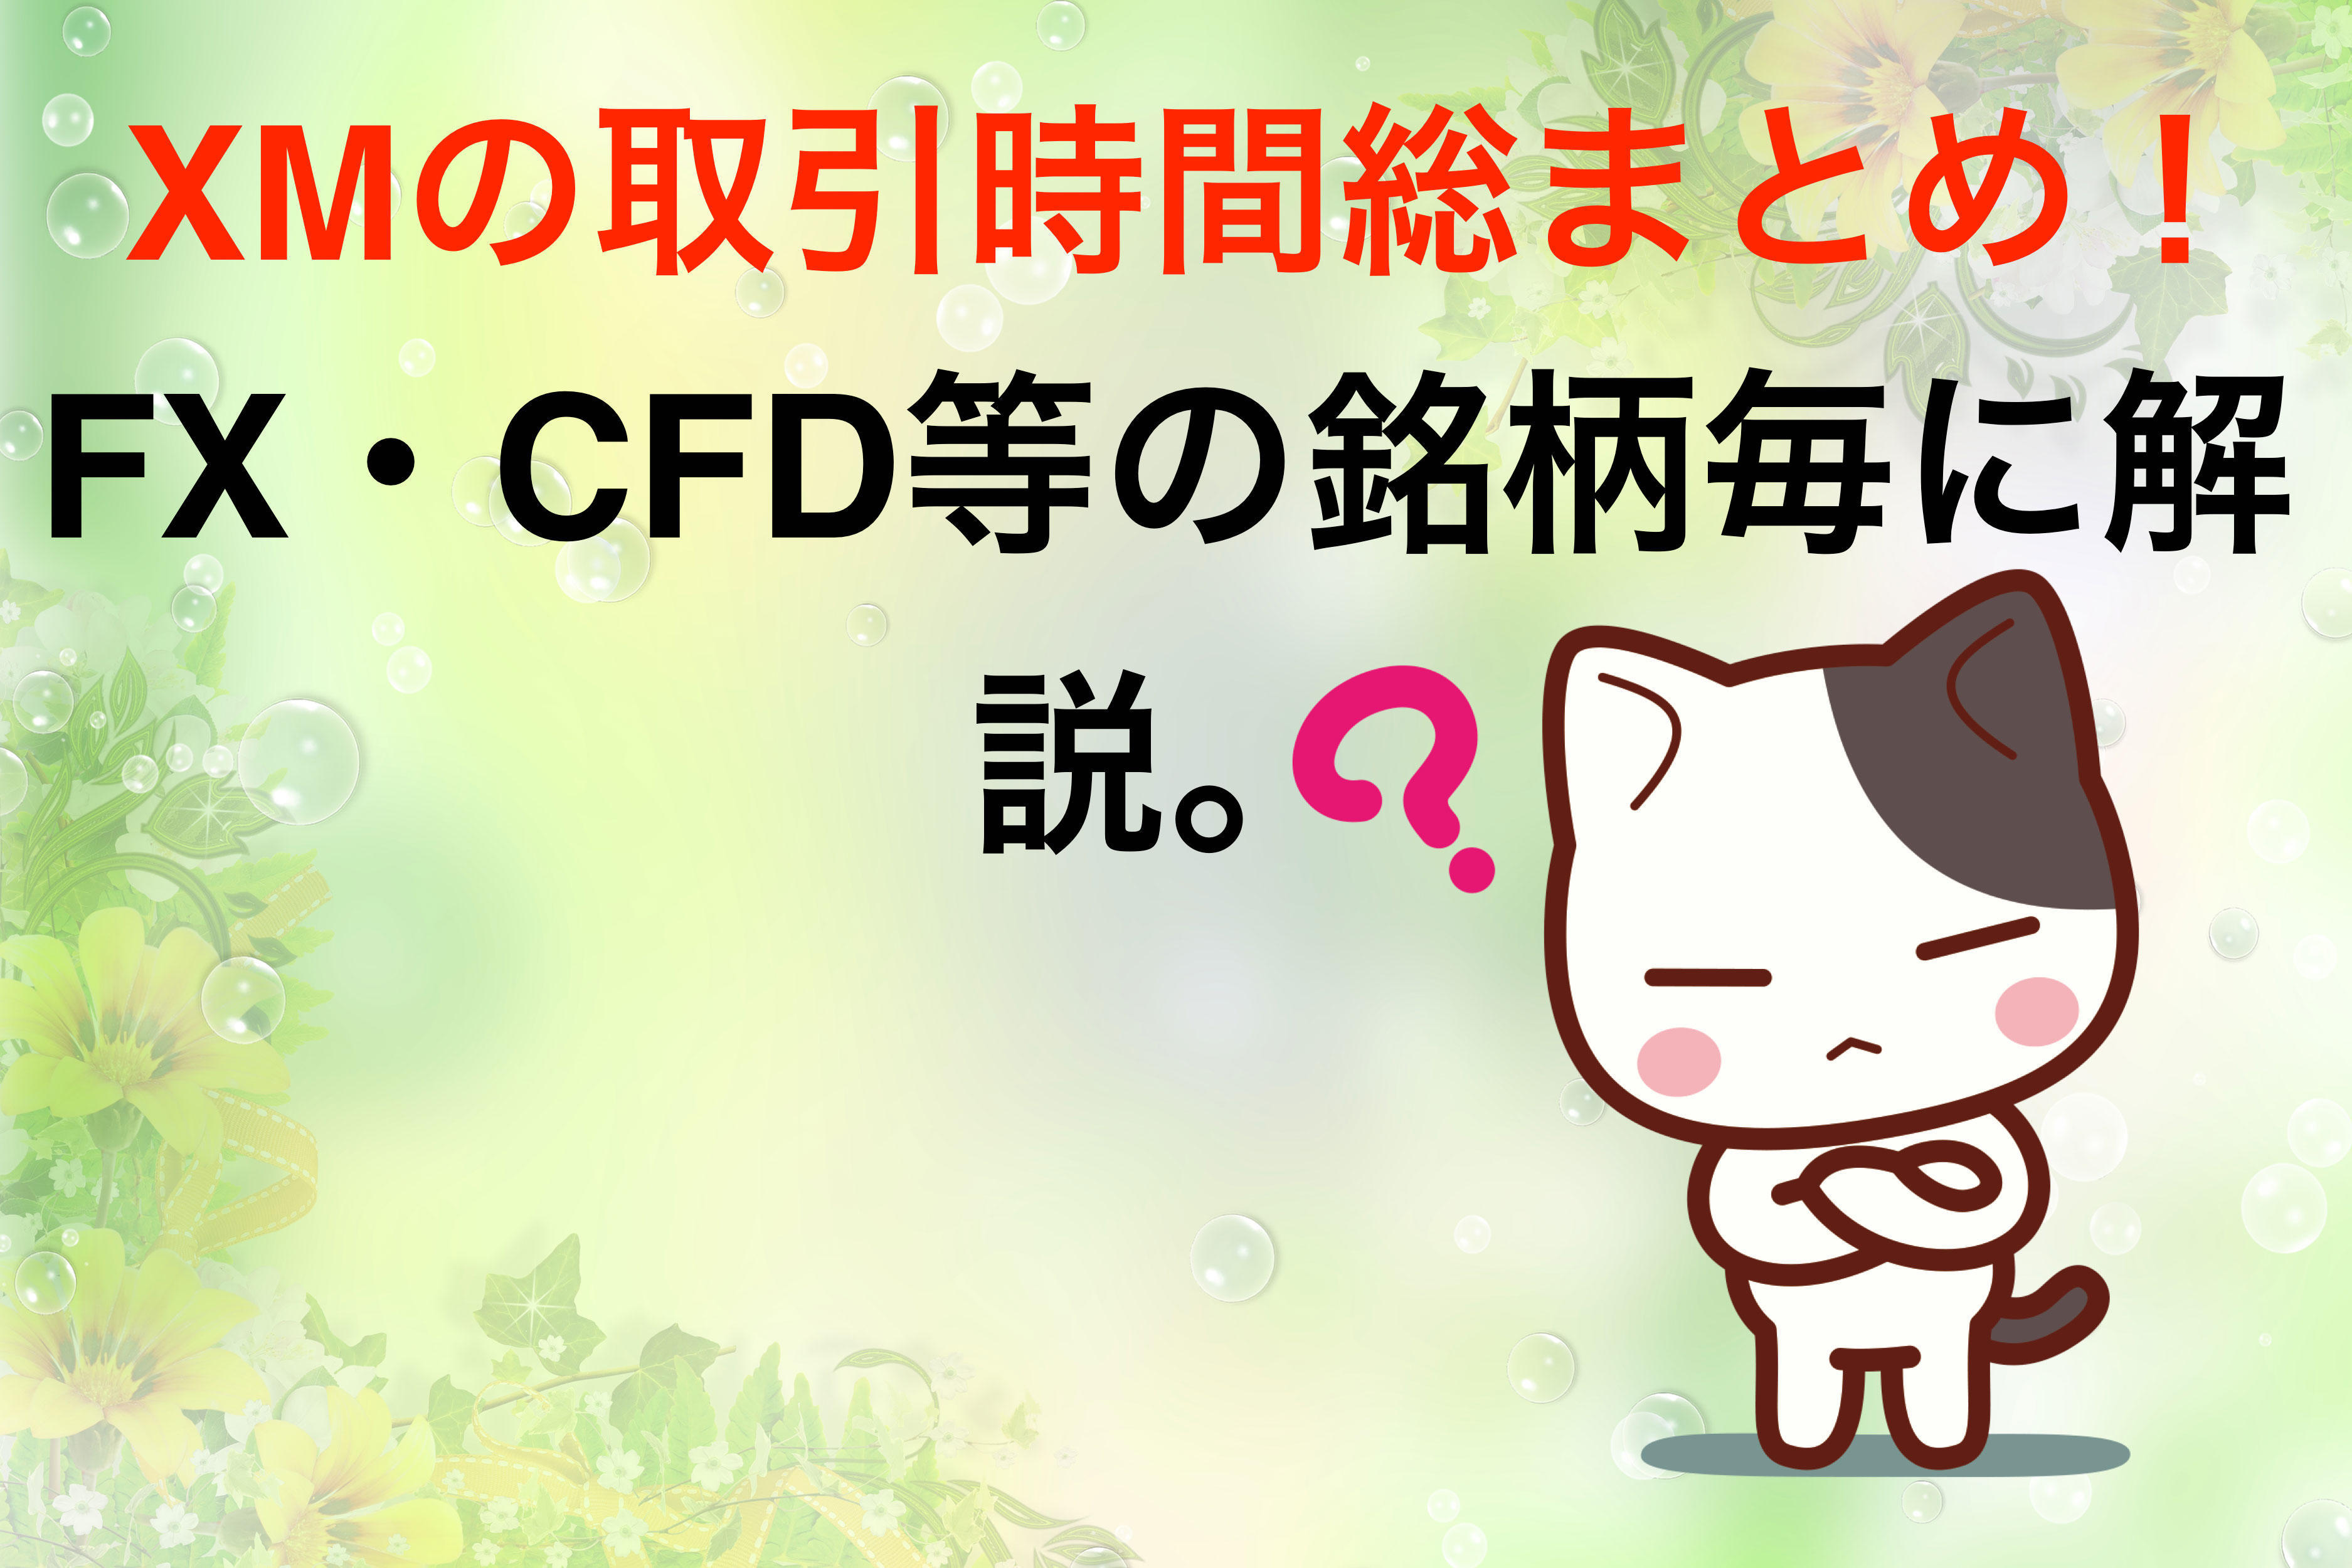 XMの取引時間総まとめ!FX・CFD等の銘柄毎に解説。